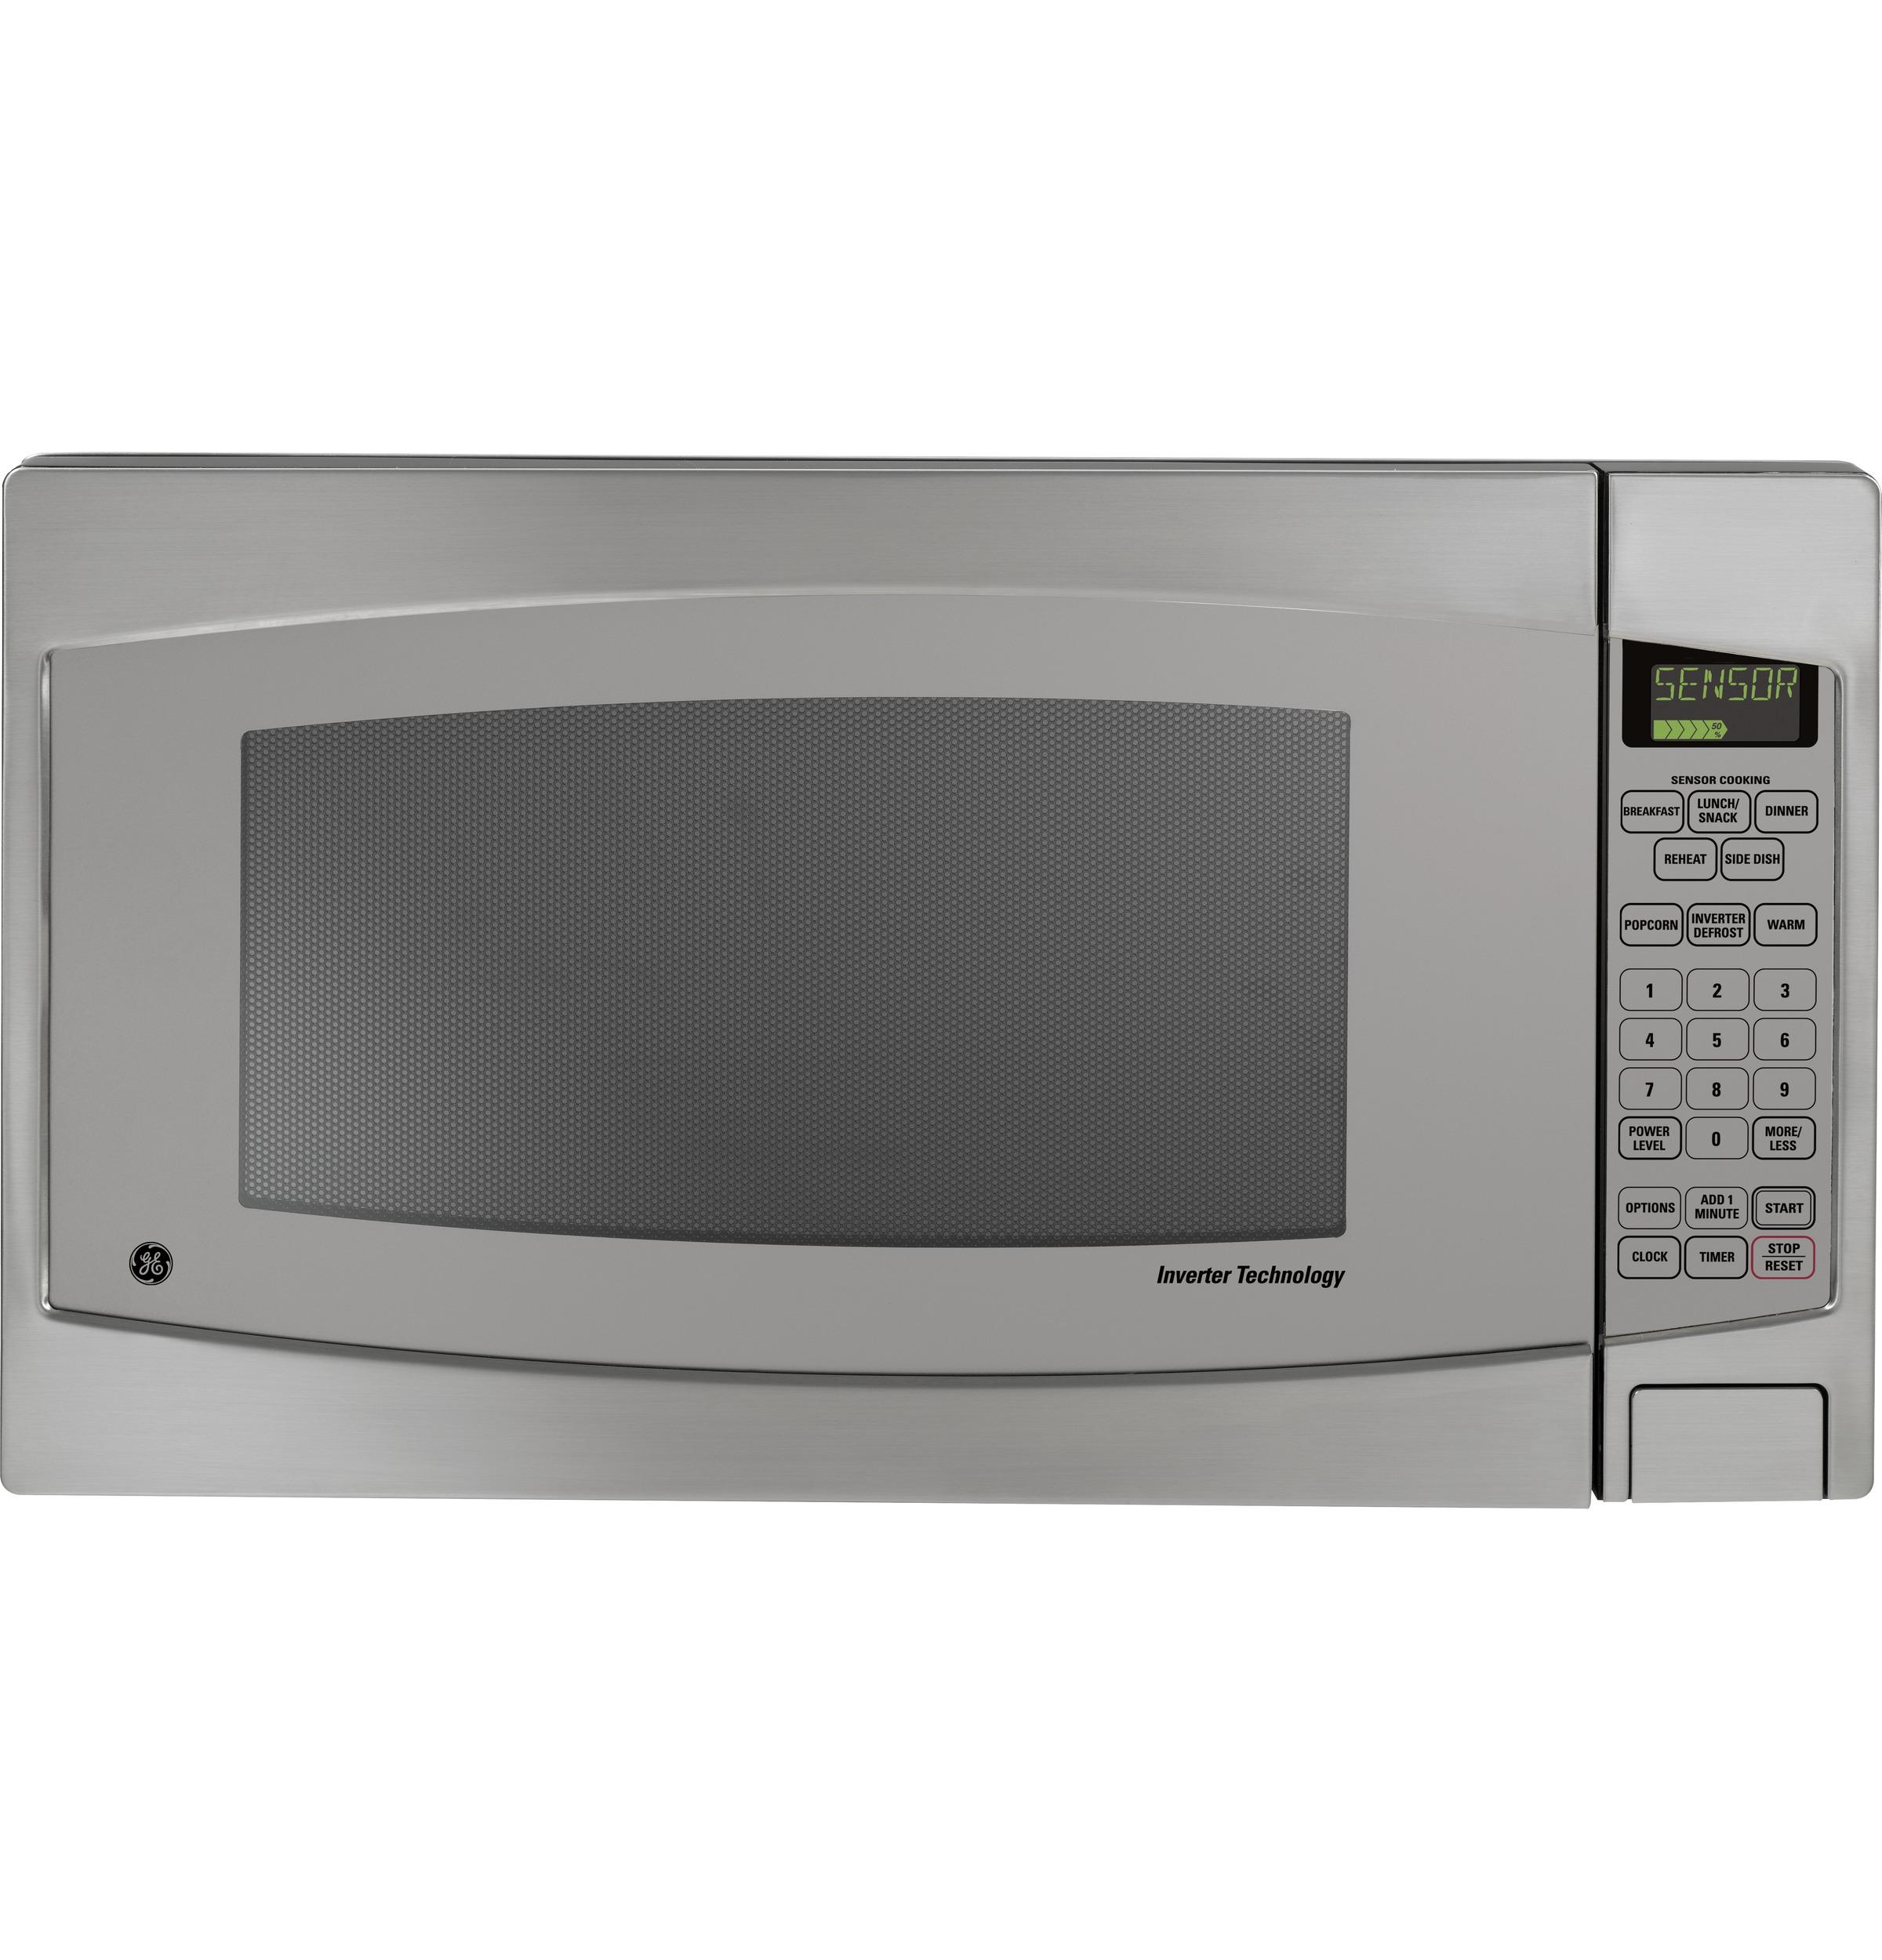 GE GE® 2.2 Cu. Ft. Capacity Countertop Microwave Oven